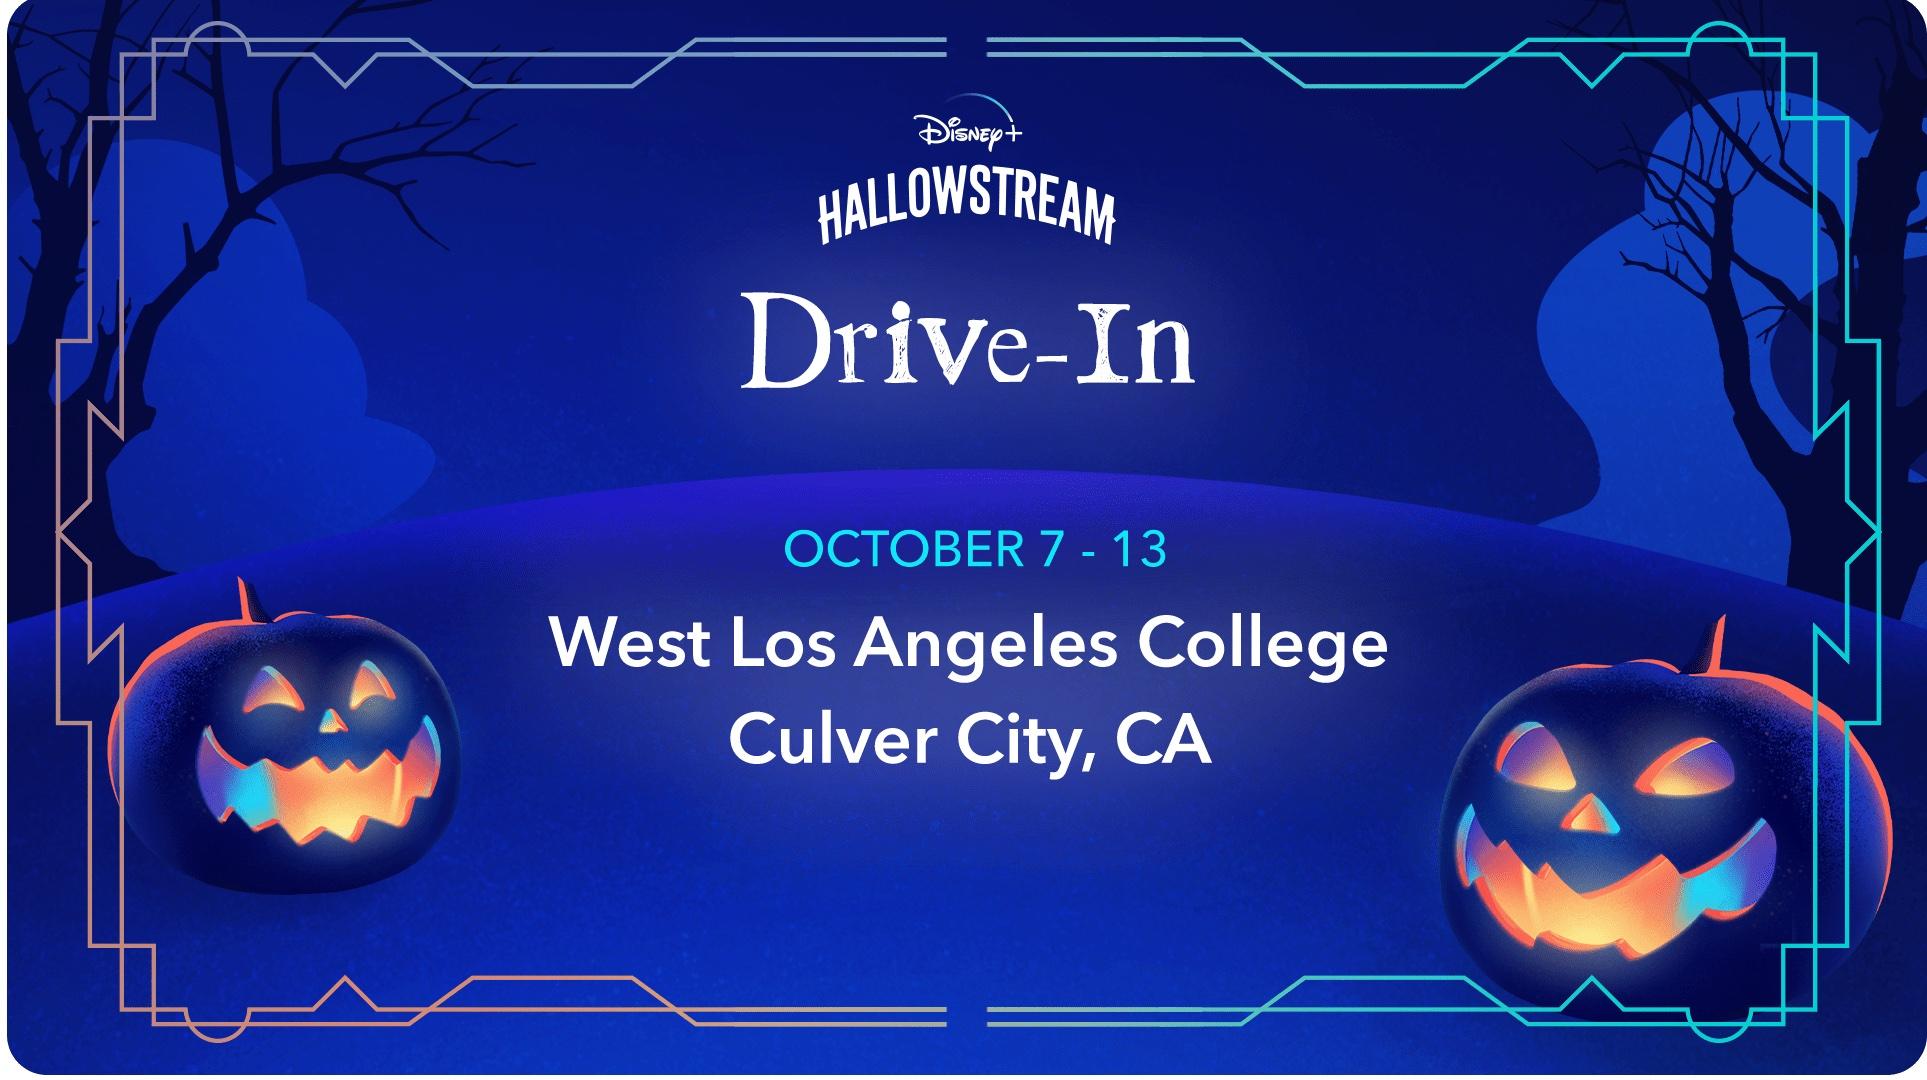 Disney+ Hallowstream Drive-In